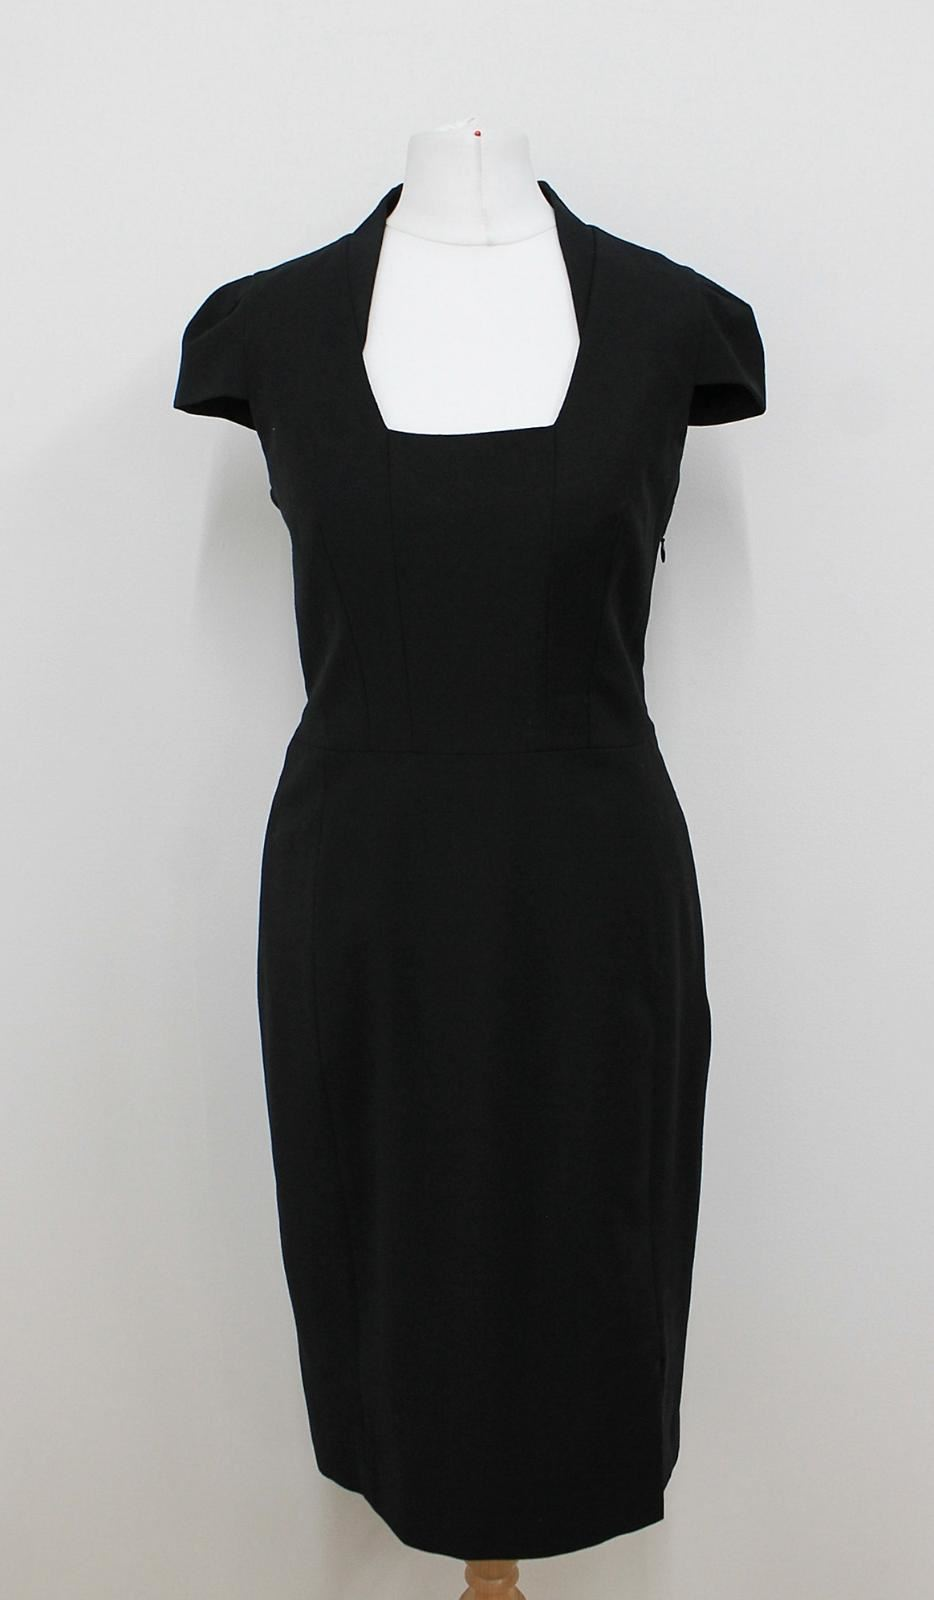 REISS-Ladies-Black-Square-Shaped-Neck-Cap-Sleeved-Shift-Dress-Size-UK10